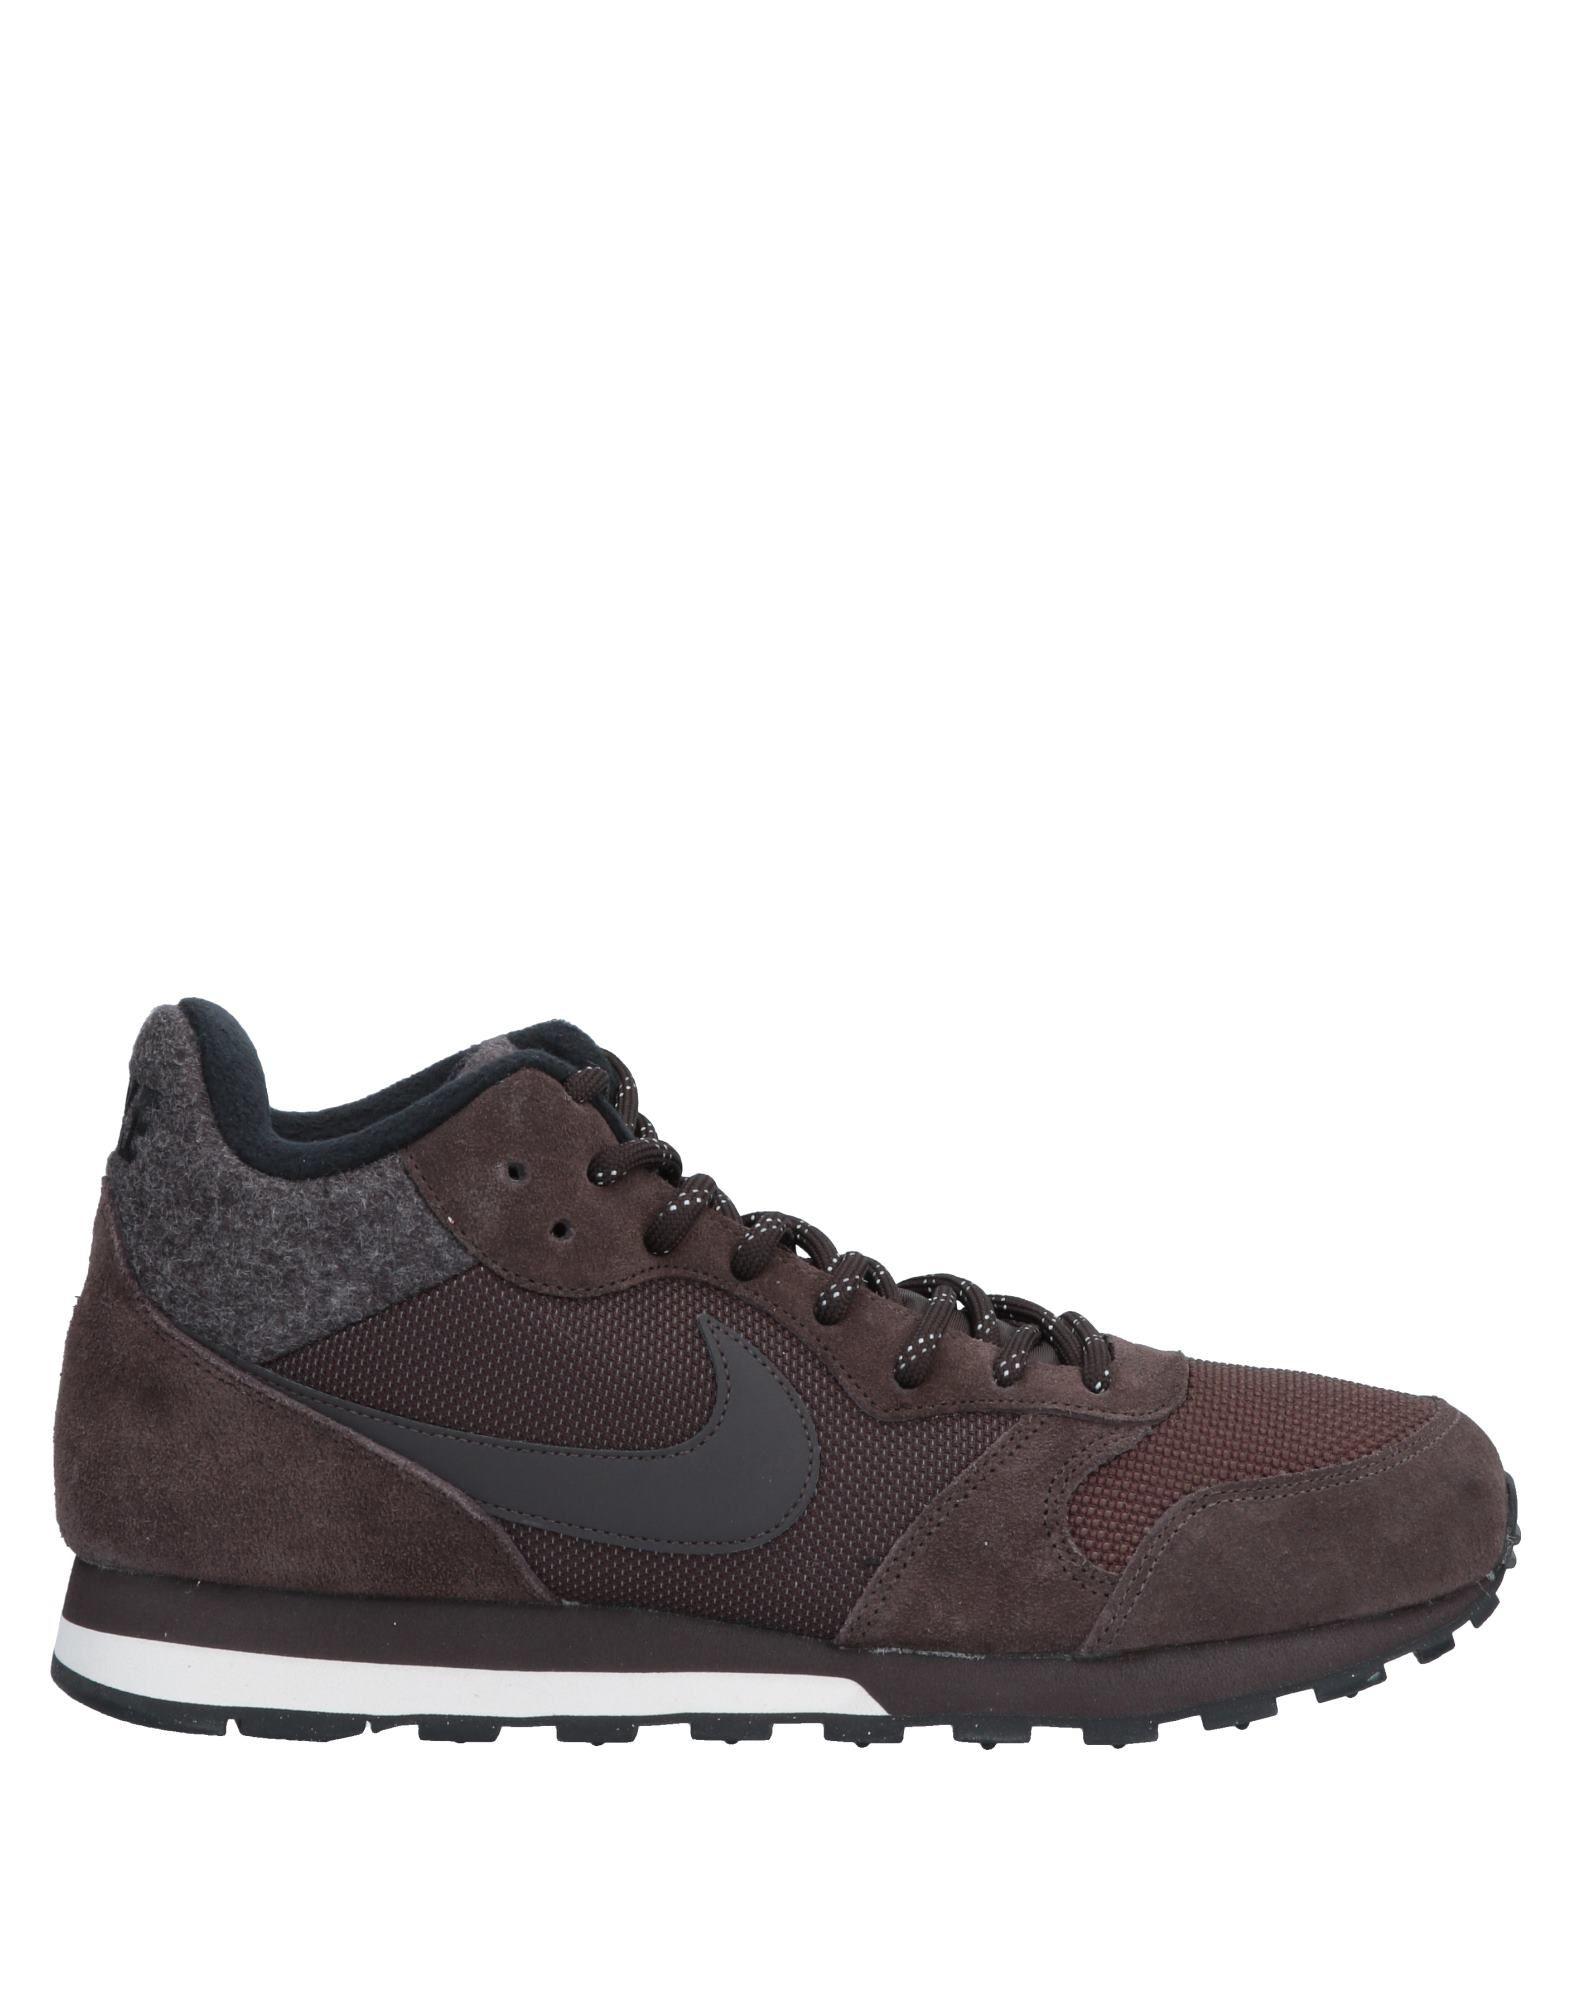 c226e70ba27 NIKE ΠΑΠΟΥΤΣΙΑ Παπούτσια τένις χαμηλά, Ανδρικά παπούτσια τέννις ...